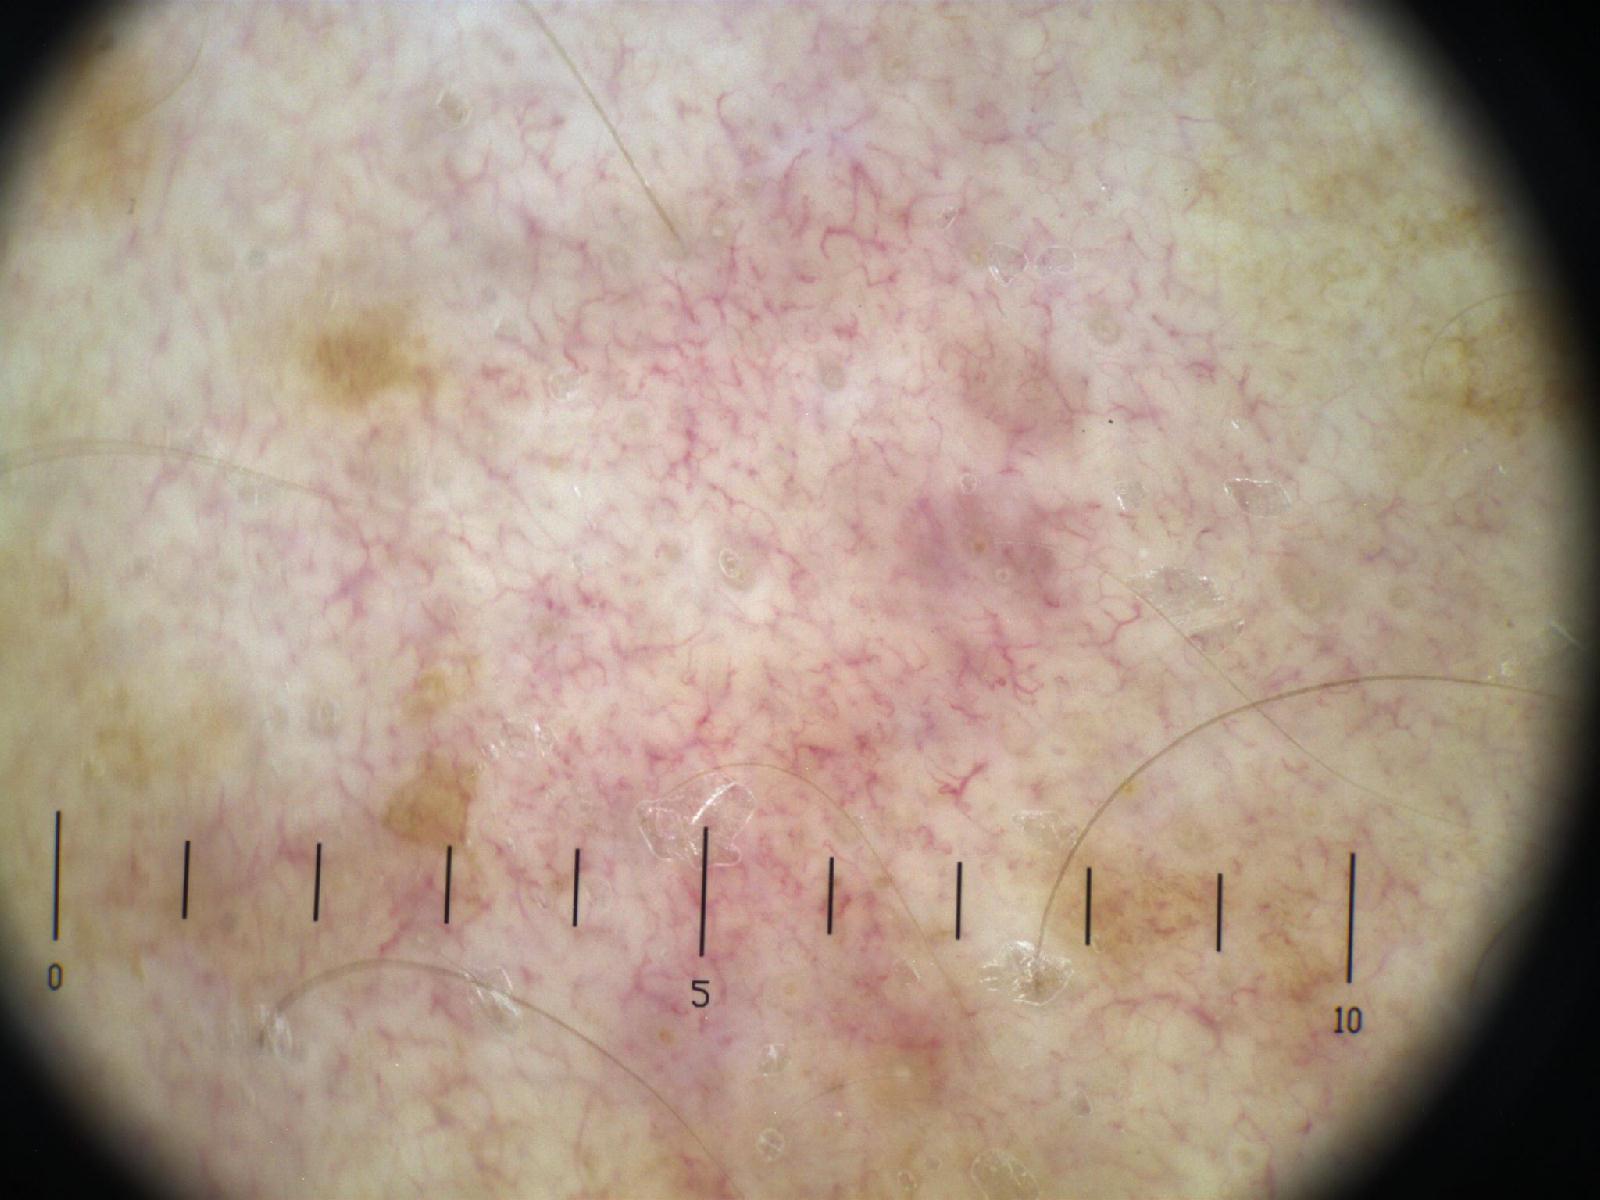 Consultations in Dermatoscopy: Tim Hackett - Hypopigmentation